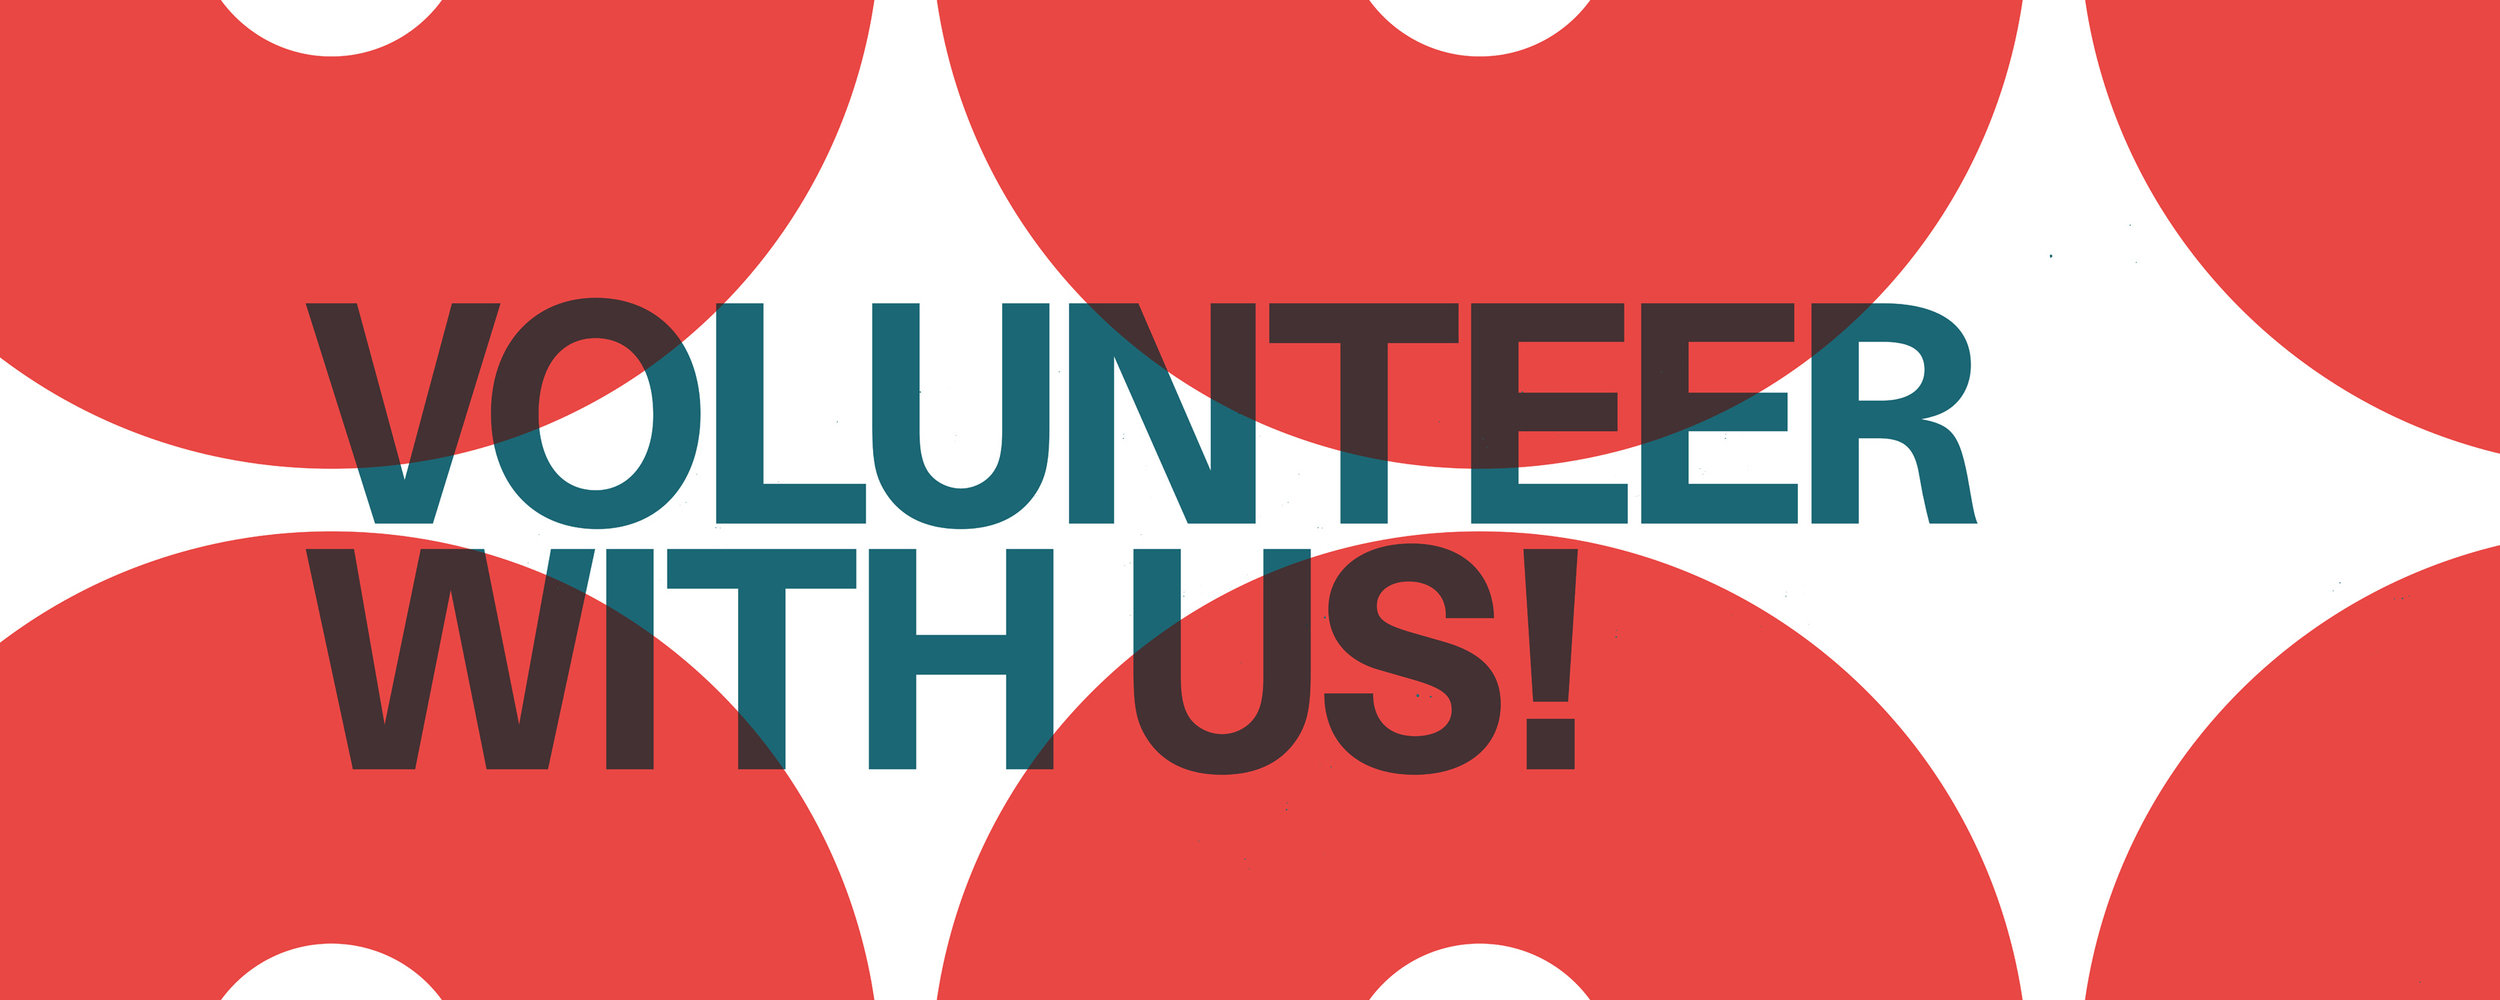 Website_Banner_Volunteer_lrs.jpg